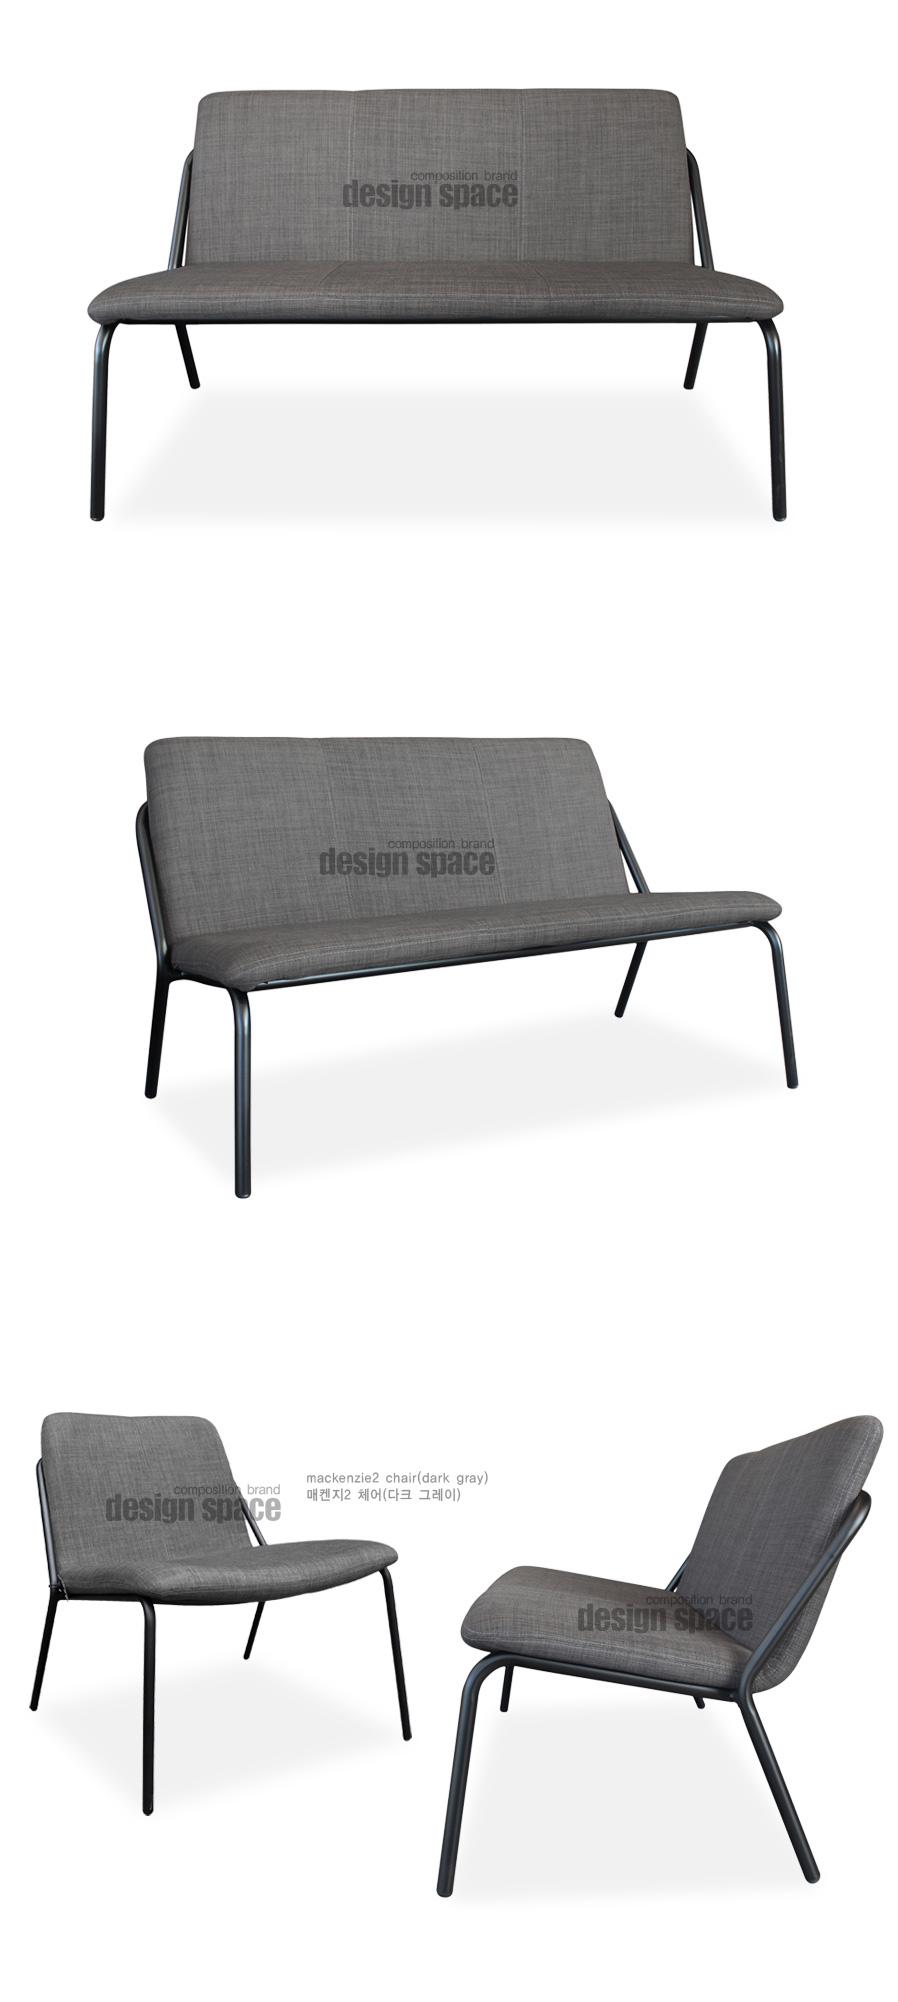 mackenzie-double-chair_03.jpg